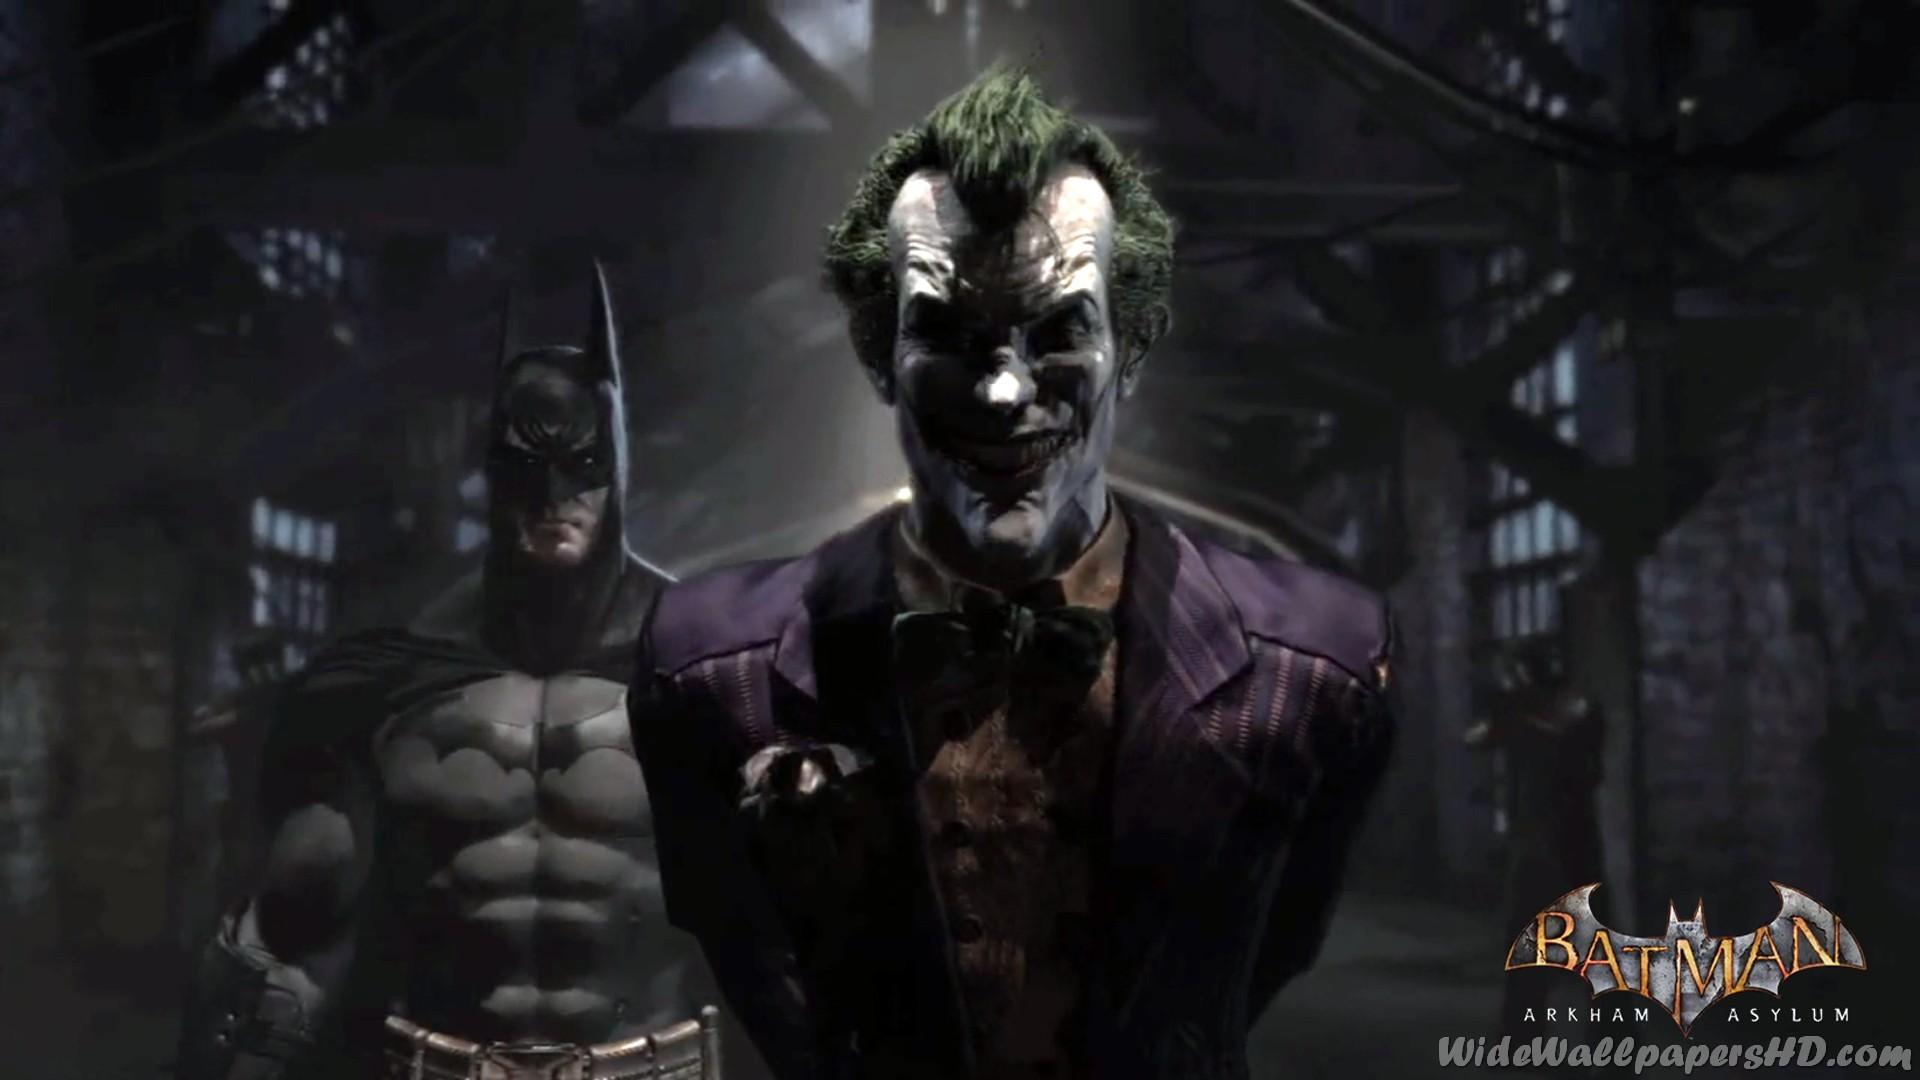 Res: 1920x1080, Batman-With-Joker-In-Pen-Batman-Arkham-Asylum-Wallpapers.jpg